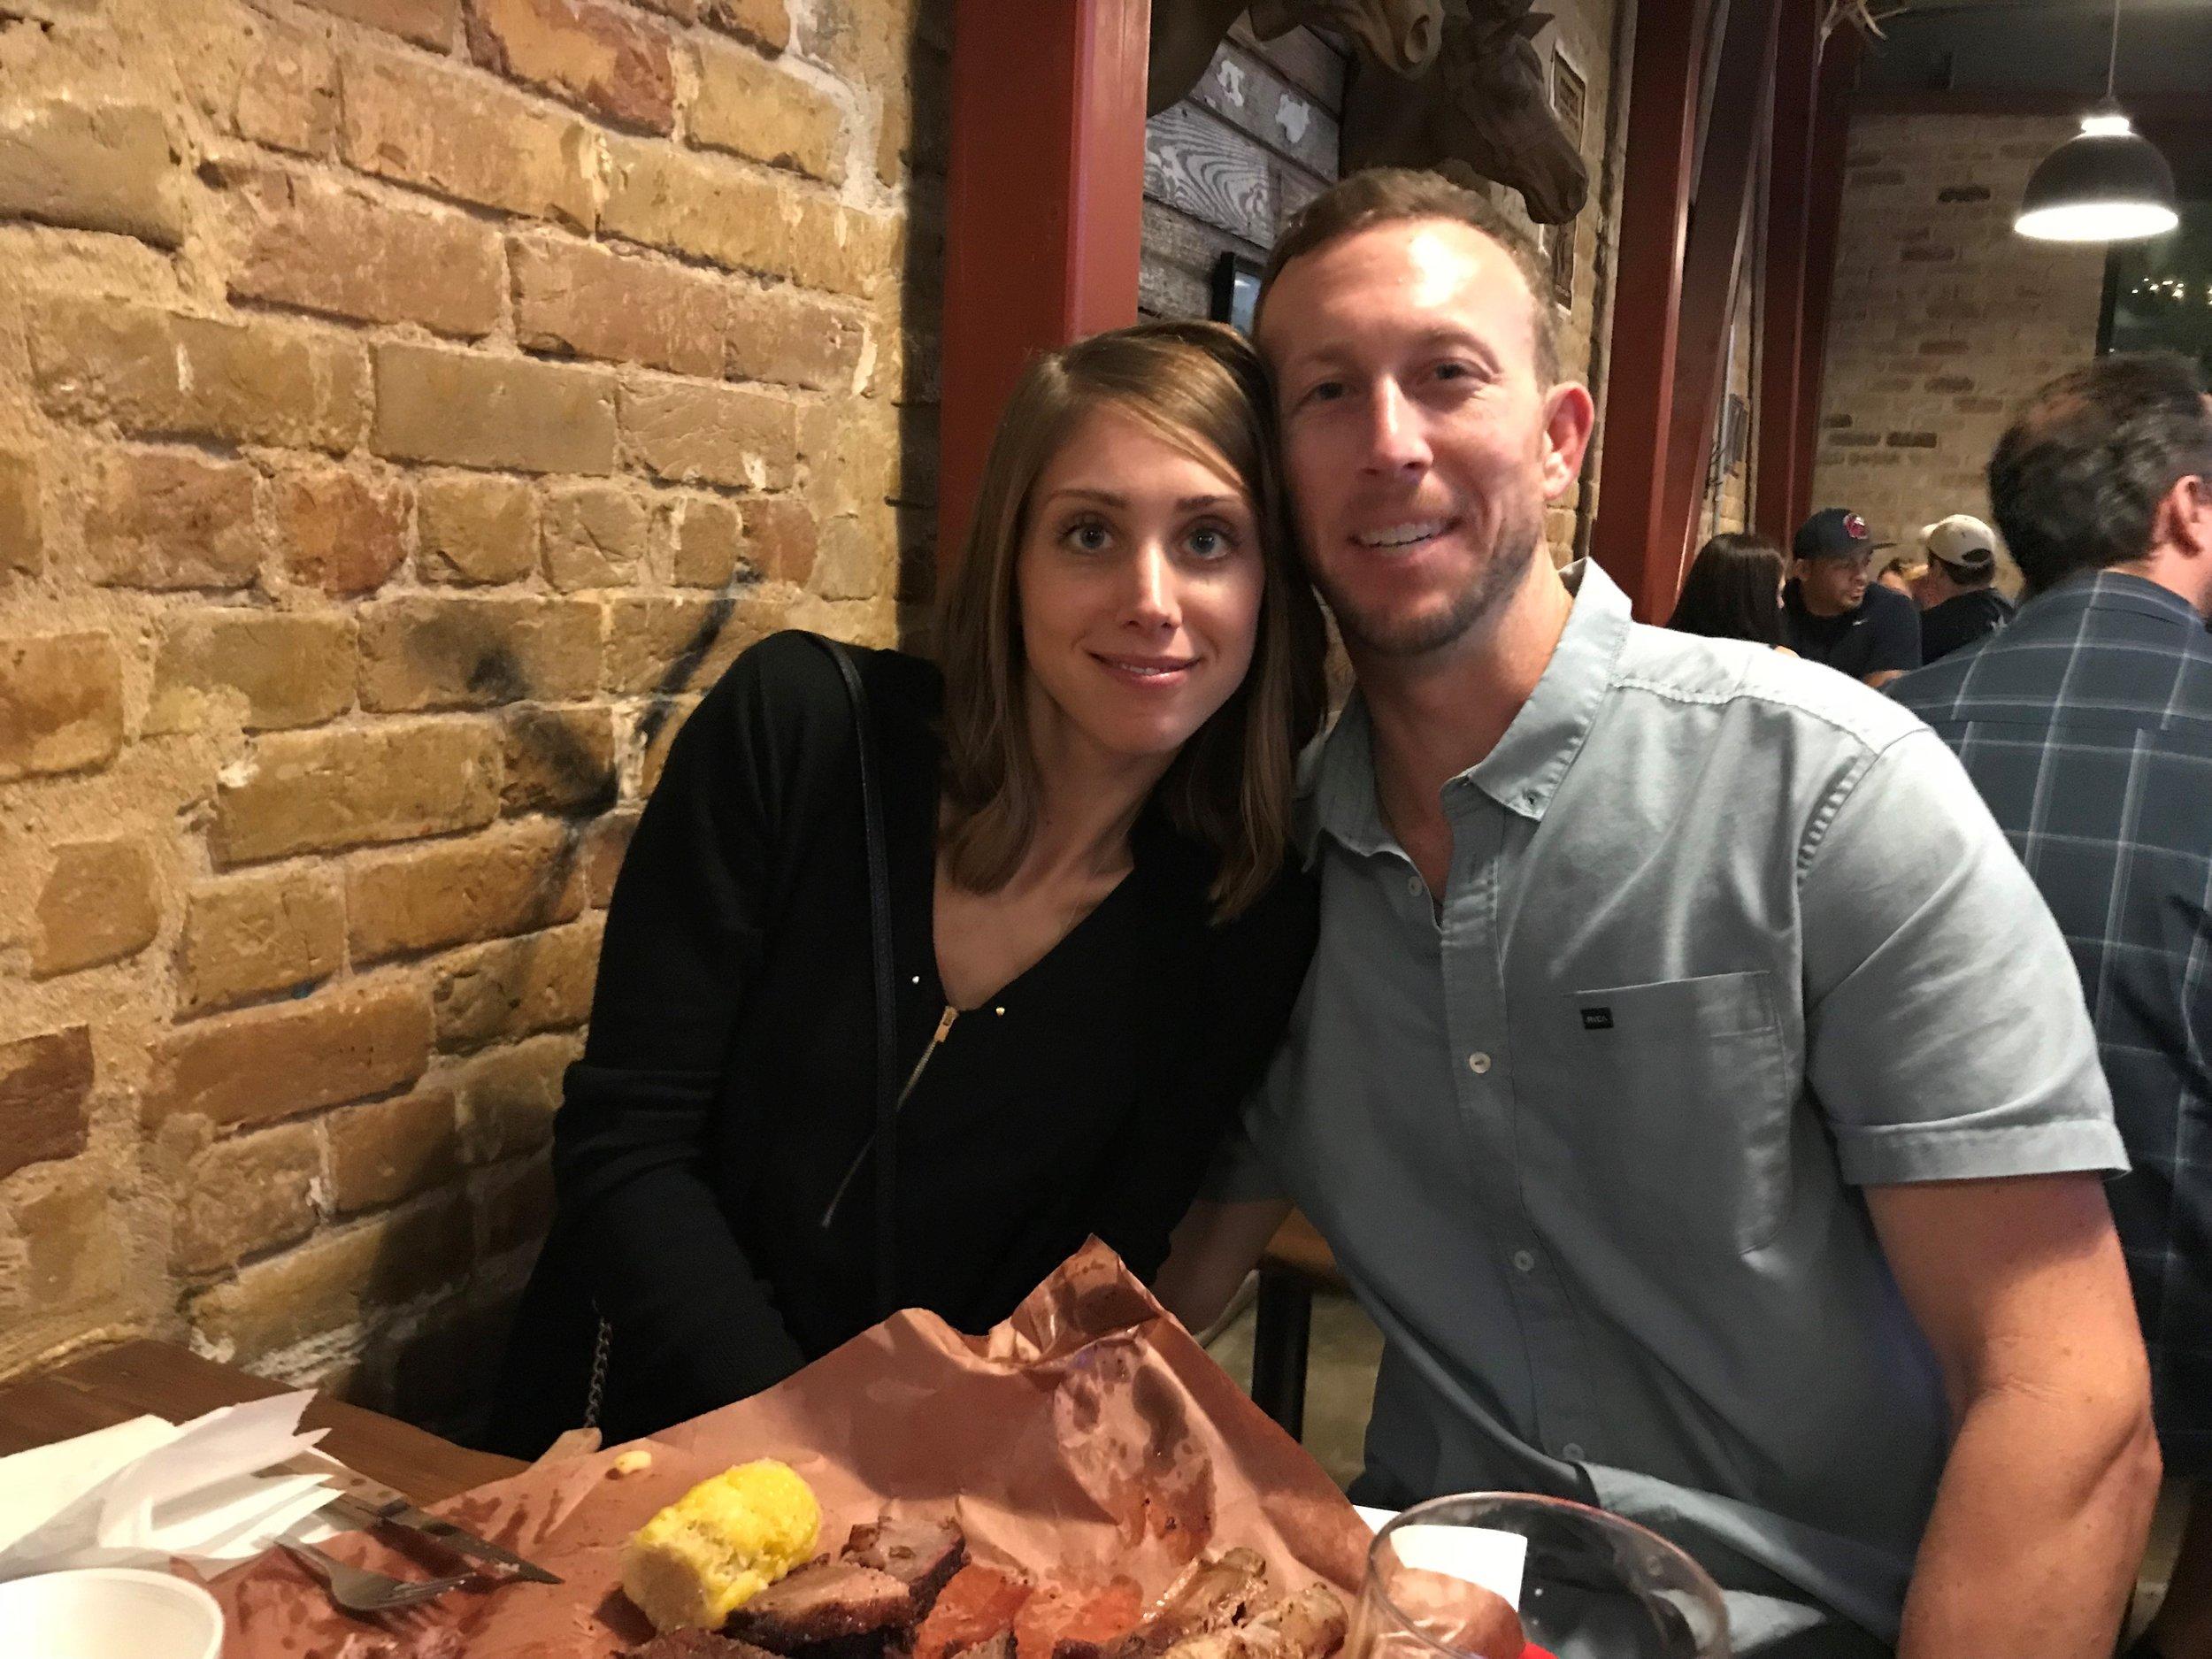 Senior Associate Justin Kuehn enjoying some local flavor with his wife, Christina.